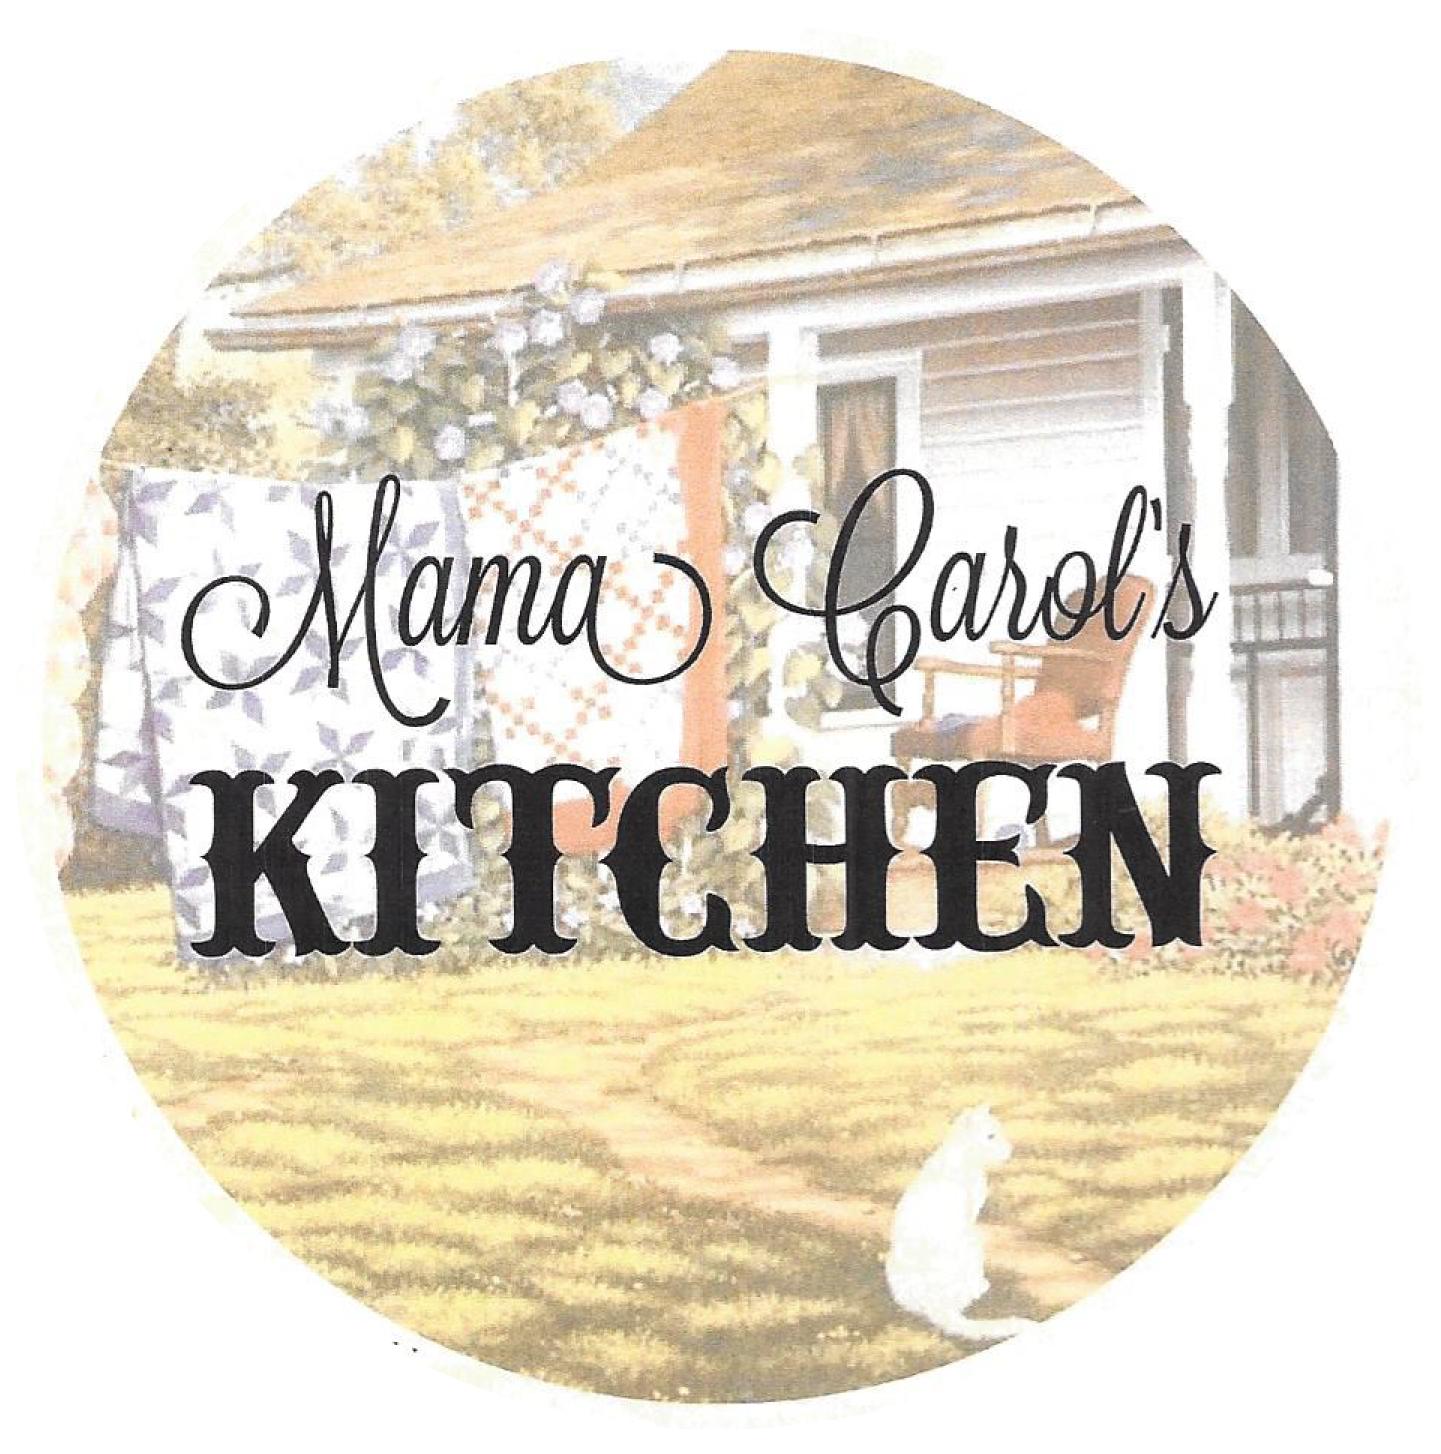 Mama Carol's Home